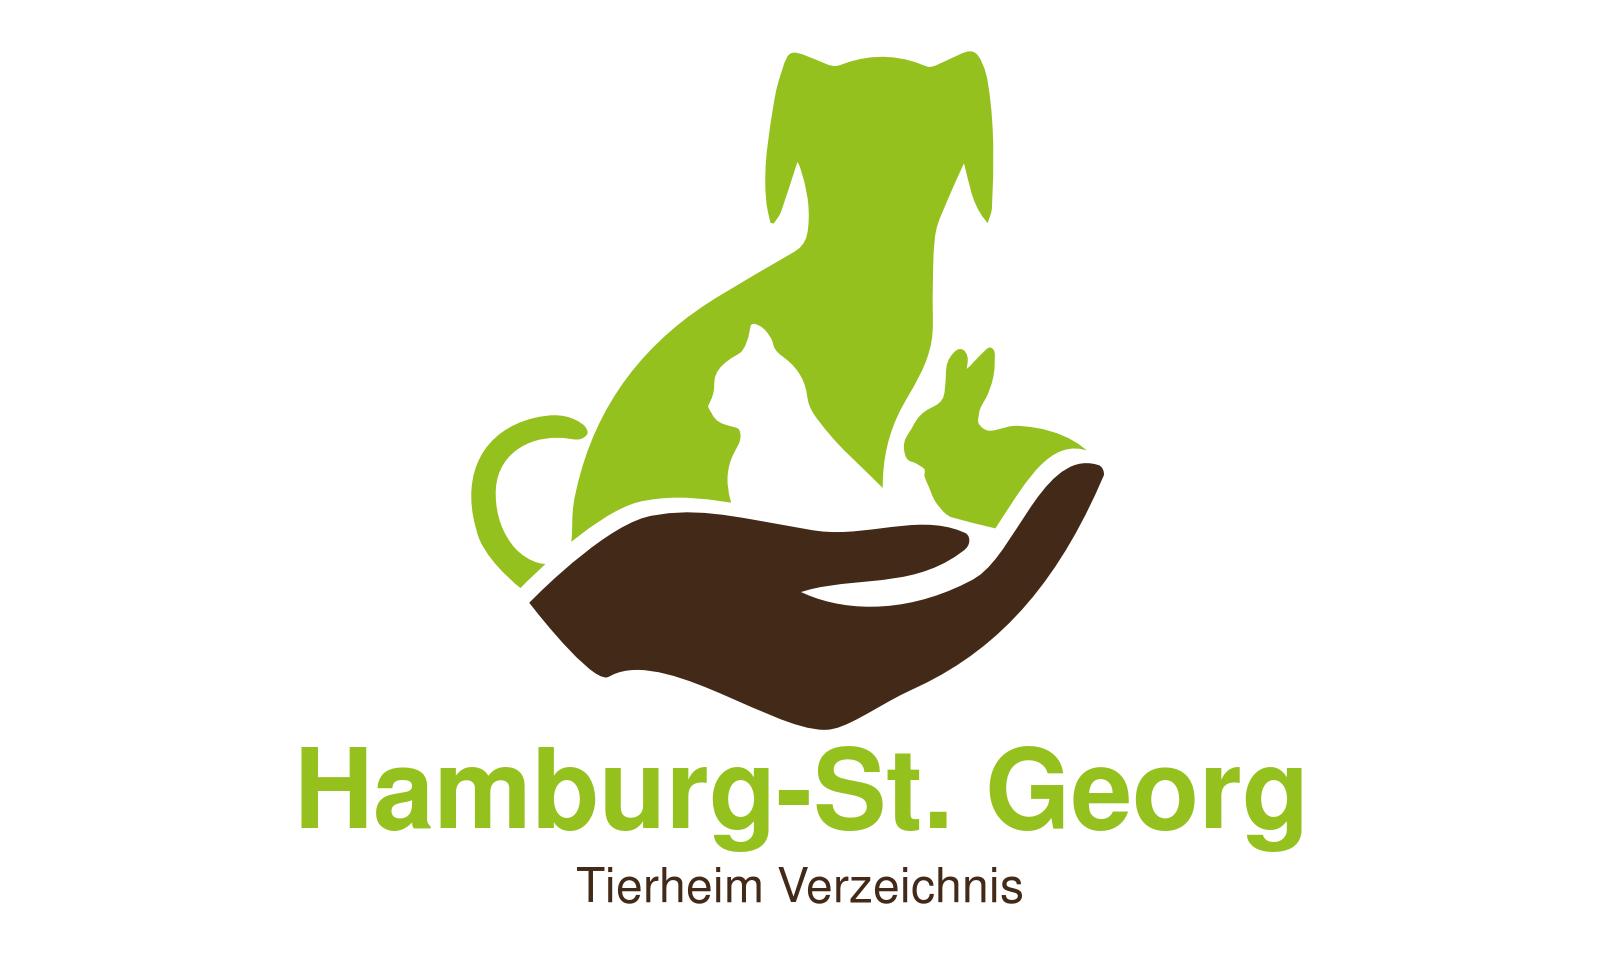 Tierheim Hamburg St. Georg